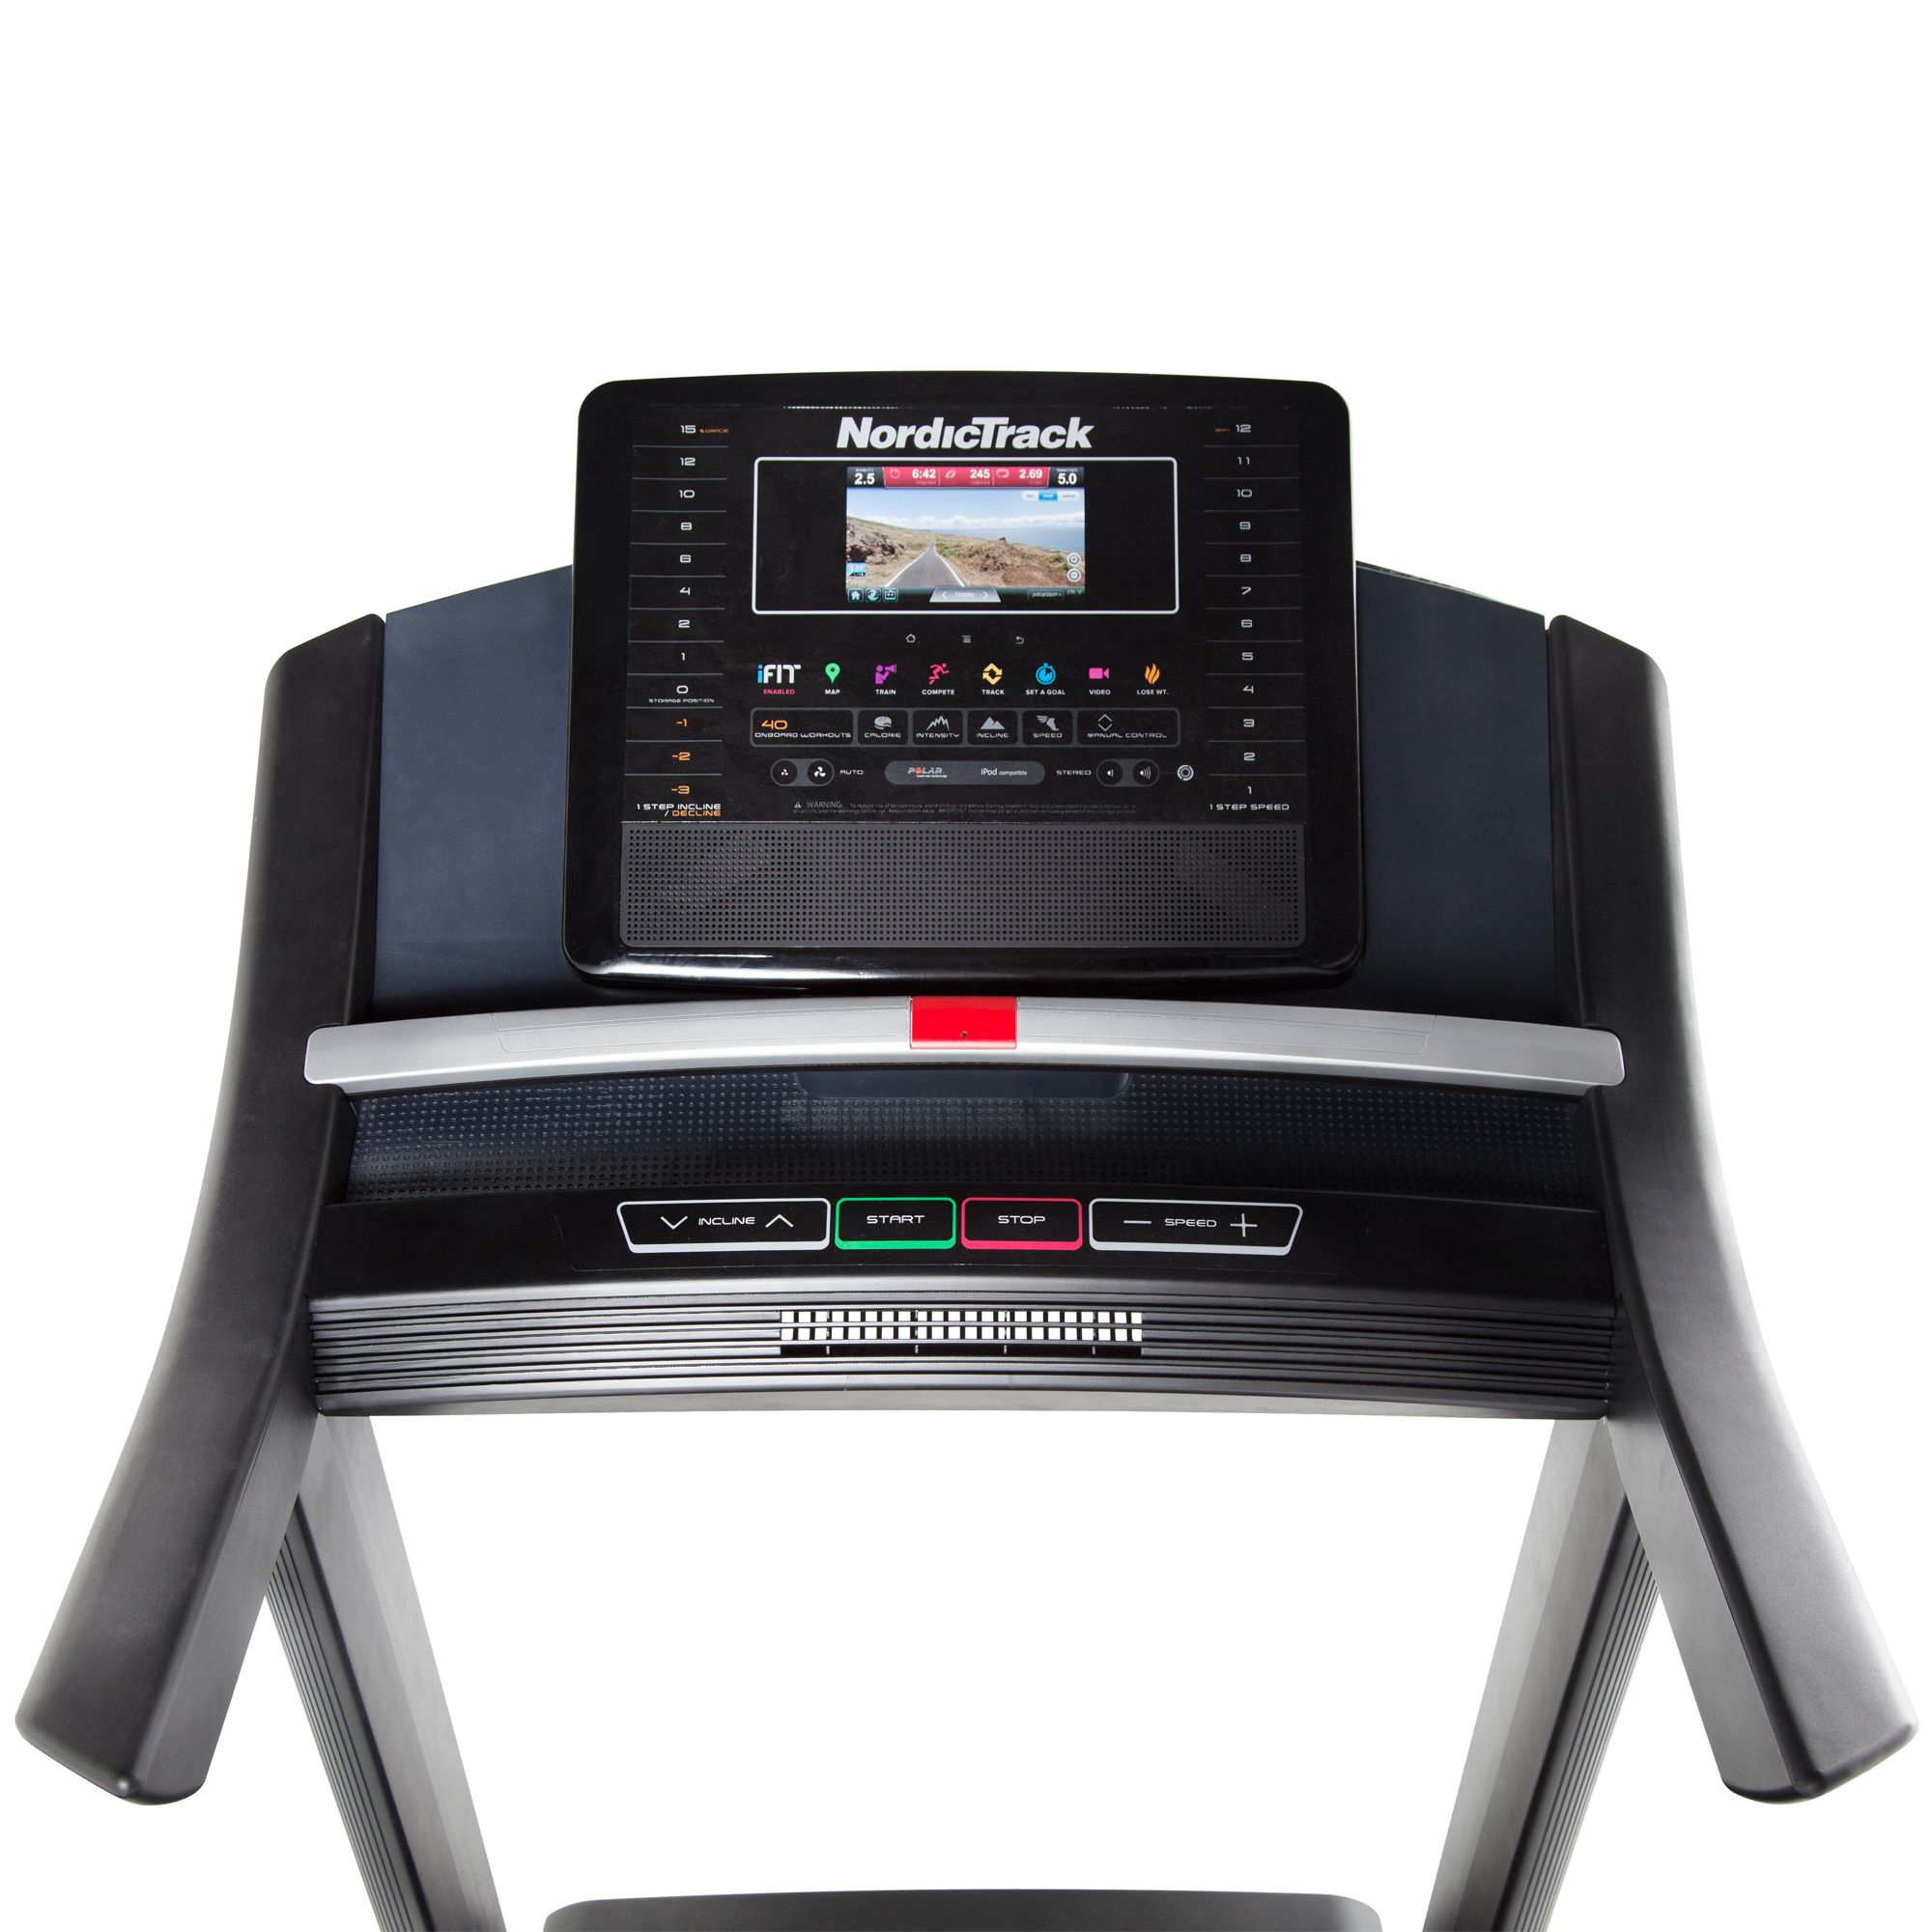 Treadmill Lubricant Nordictrack: NordicTrack T22.5 Treadmill